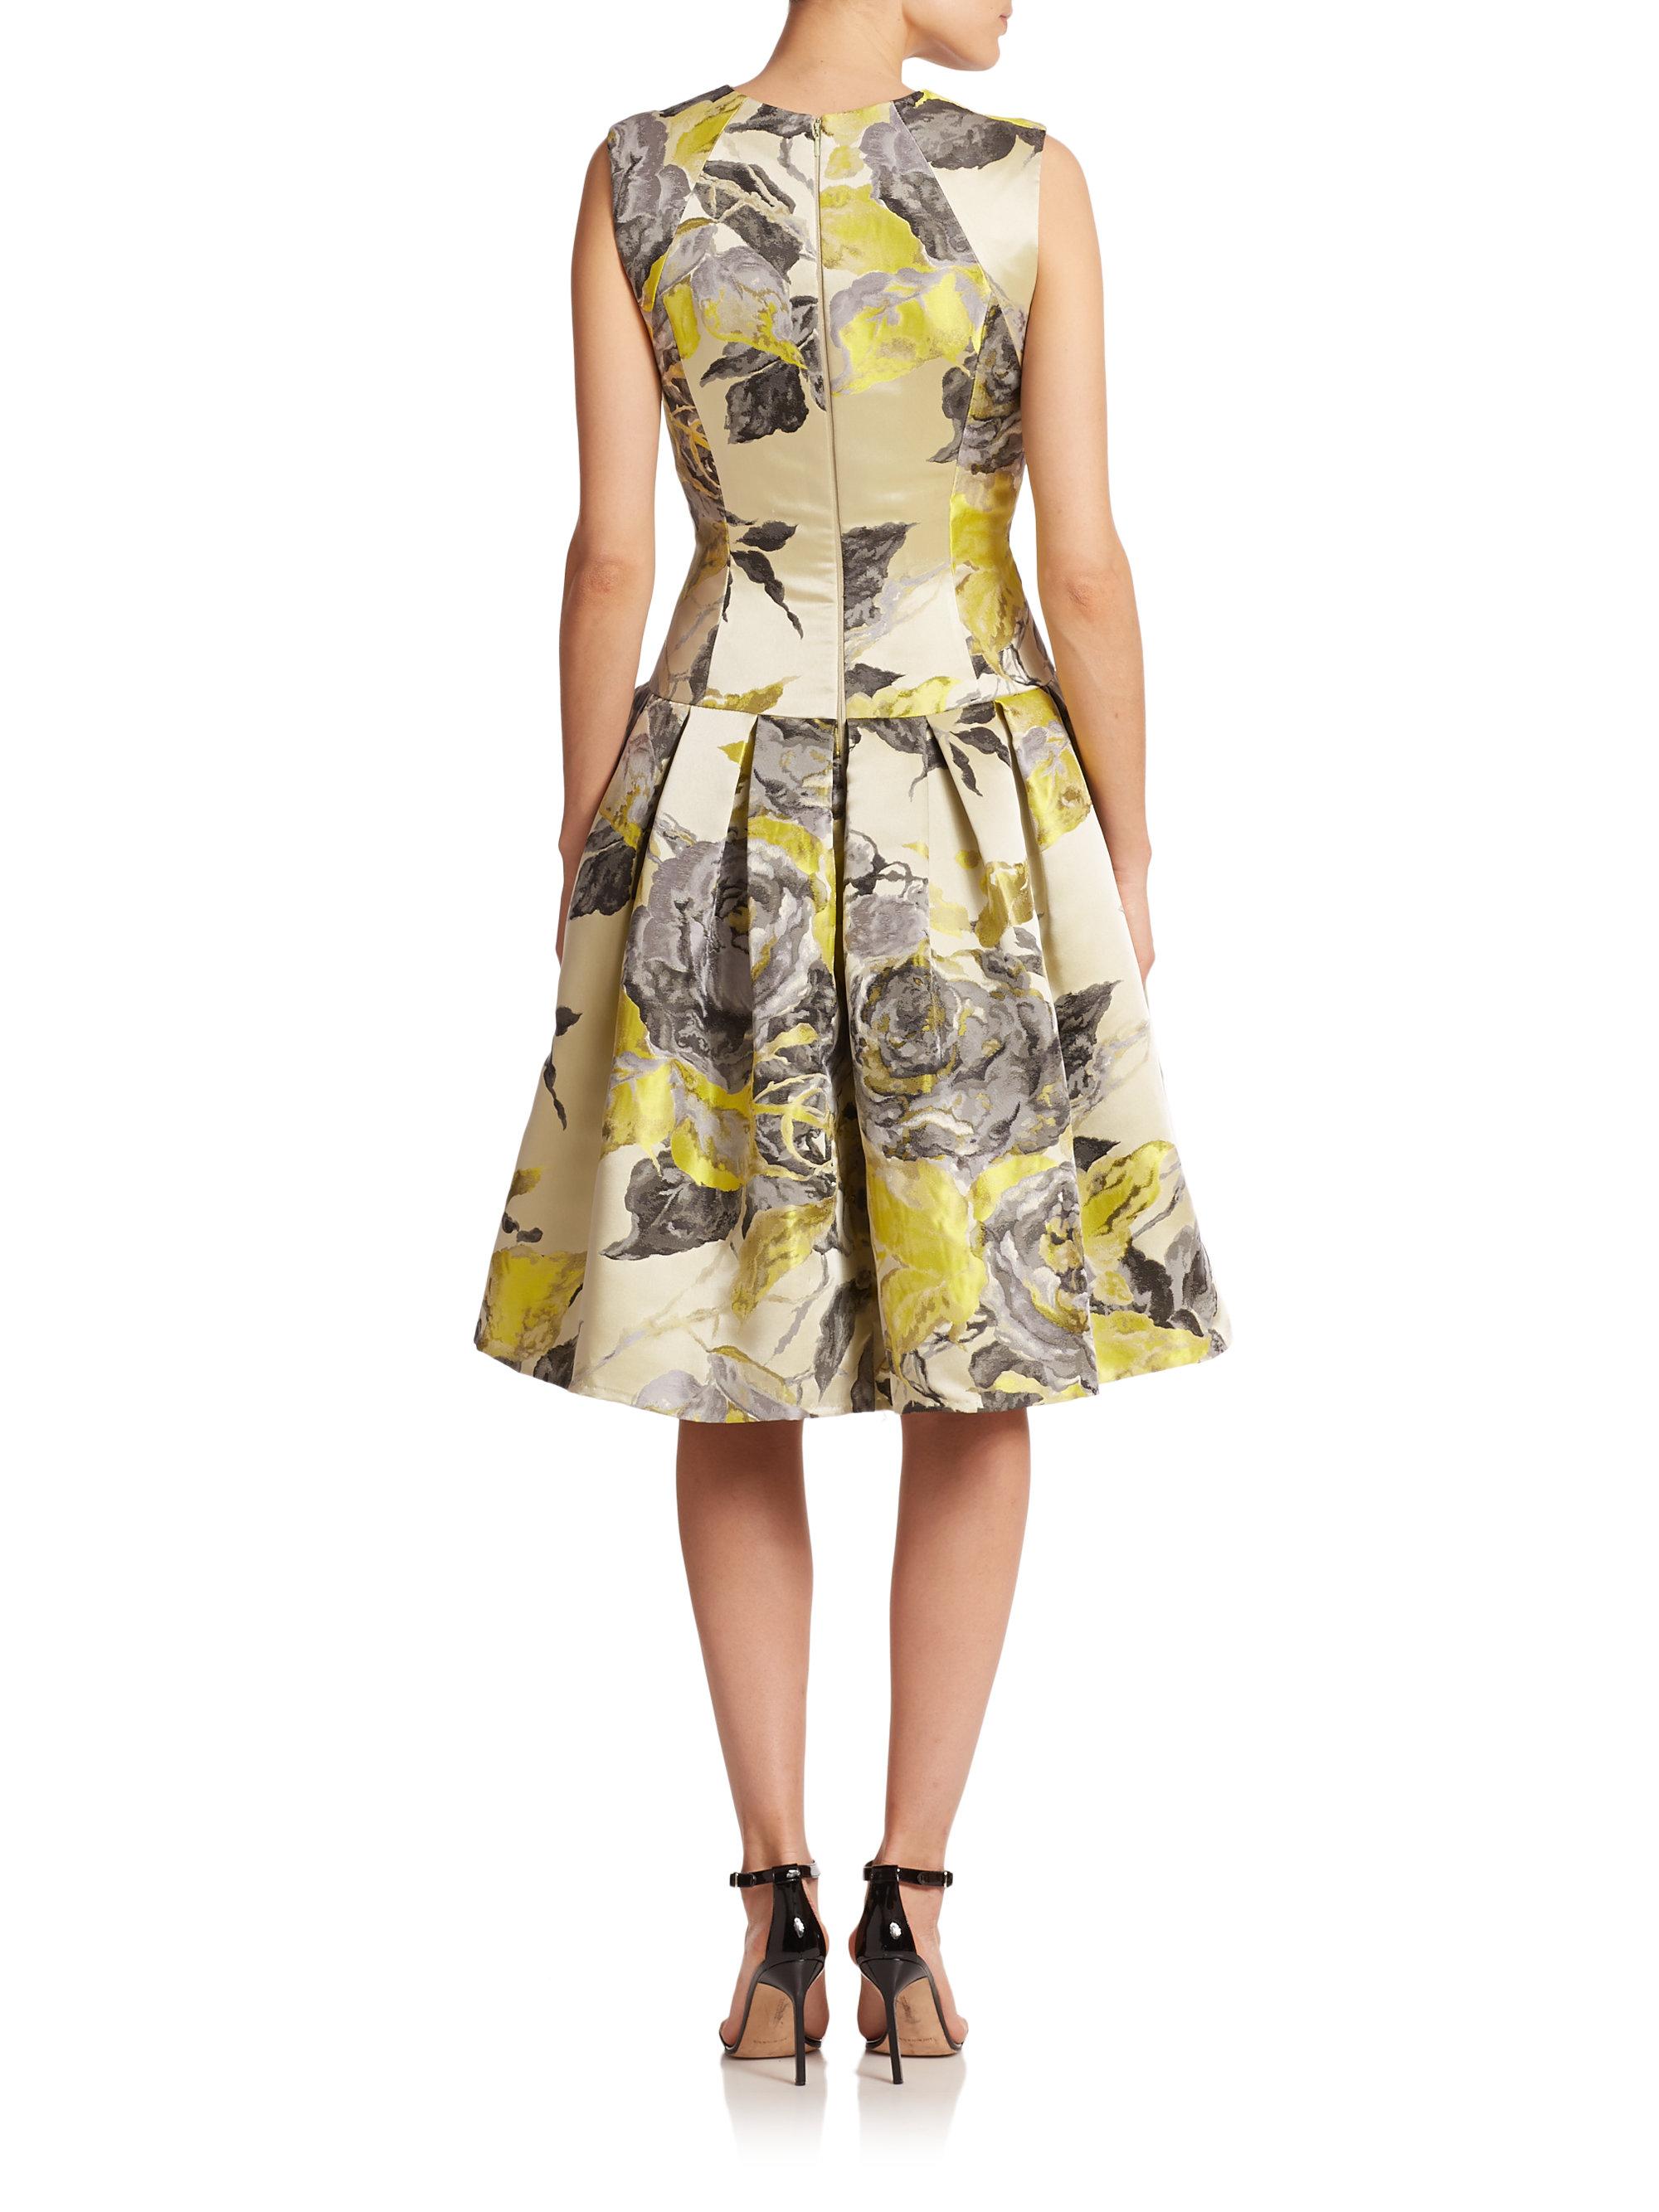 Carmen marc valvo Rose-patterned Brocade Dress in Yellow | Lyst